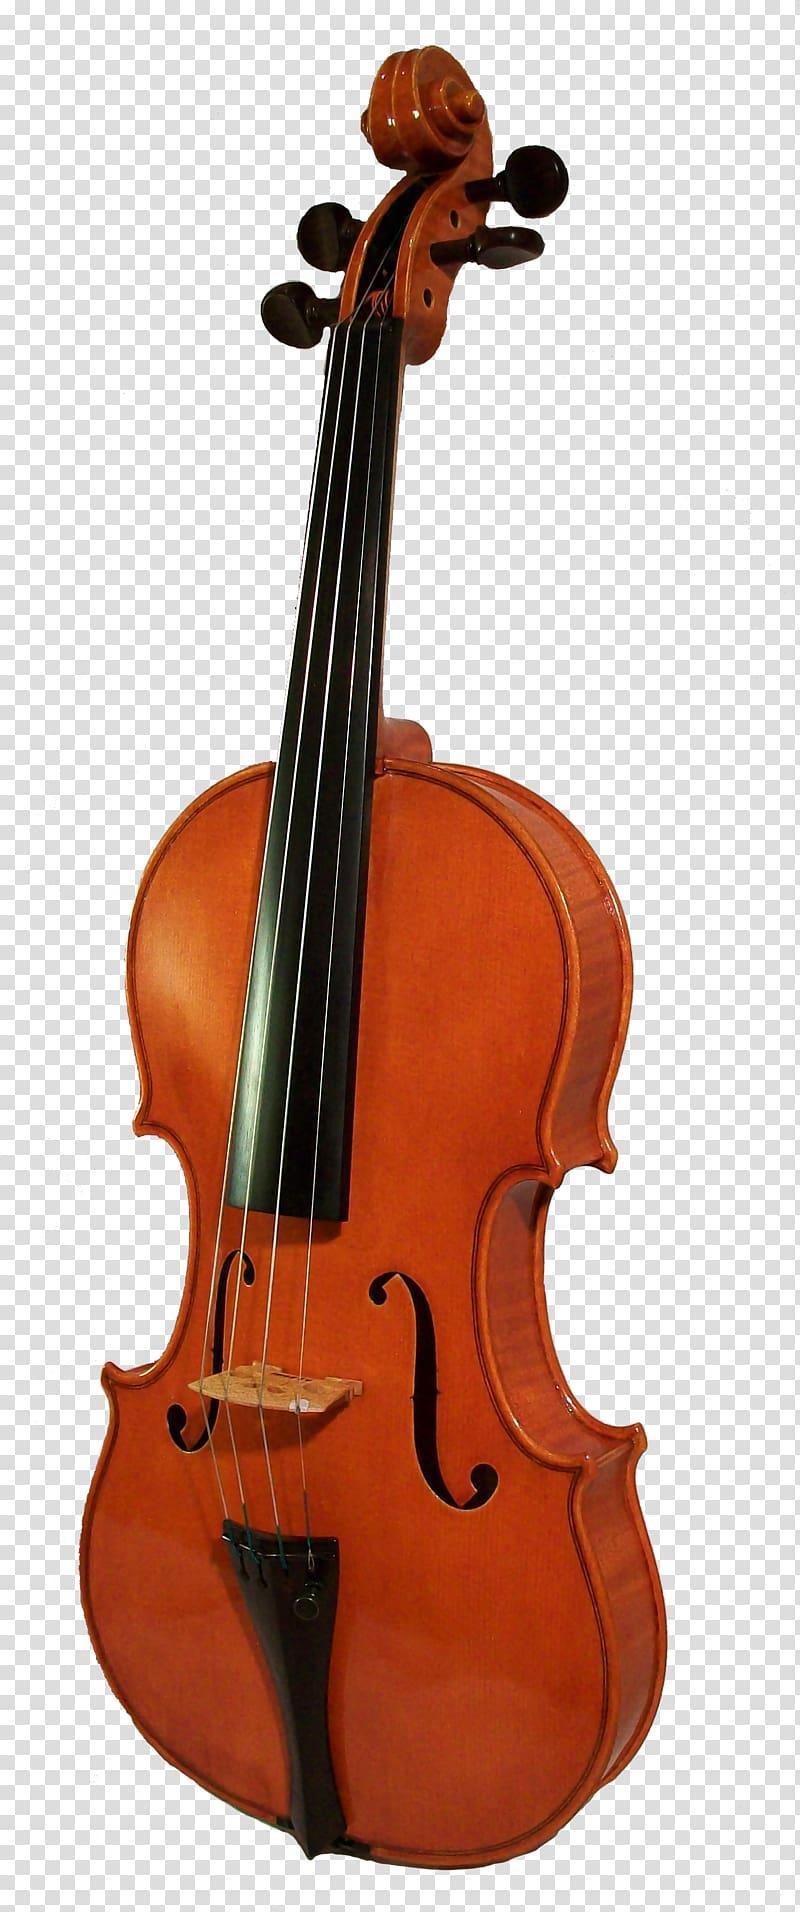 Musical instrument transparent . Cello clipart violin